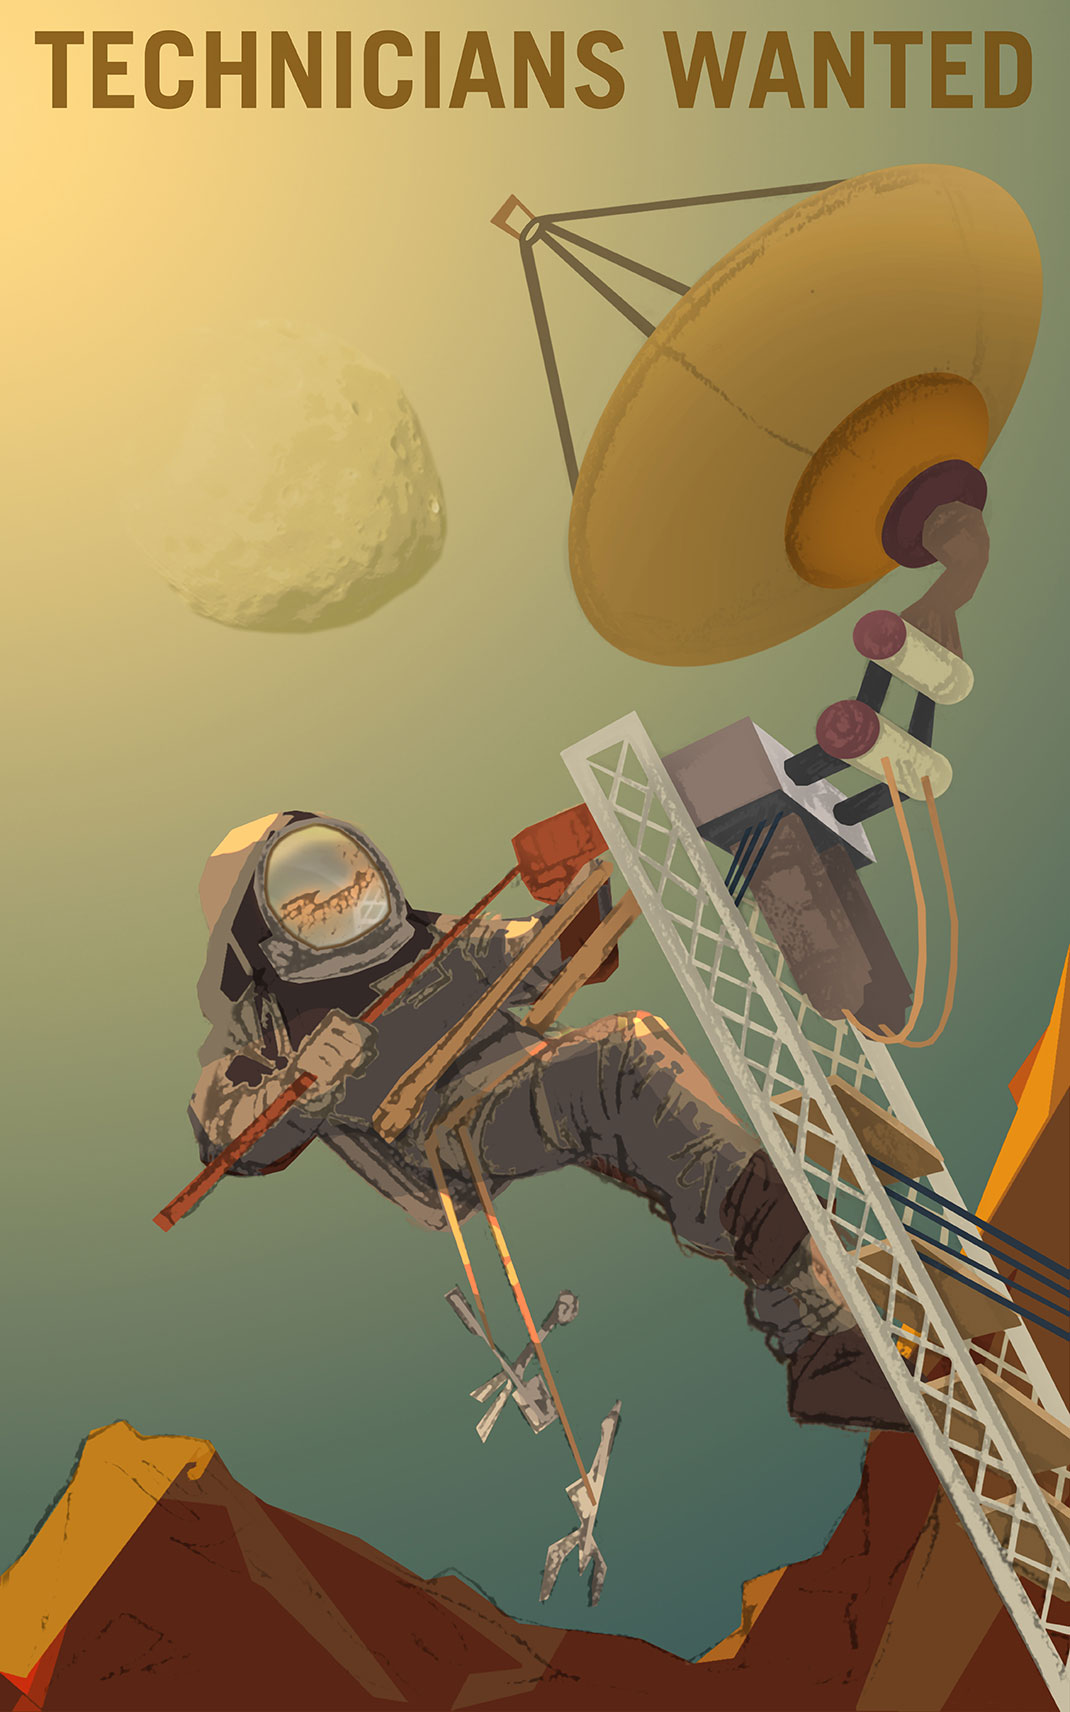 P06-Technicians-Wanted-NASA-Recruitment-Poster-600x